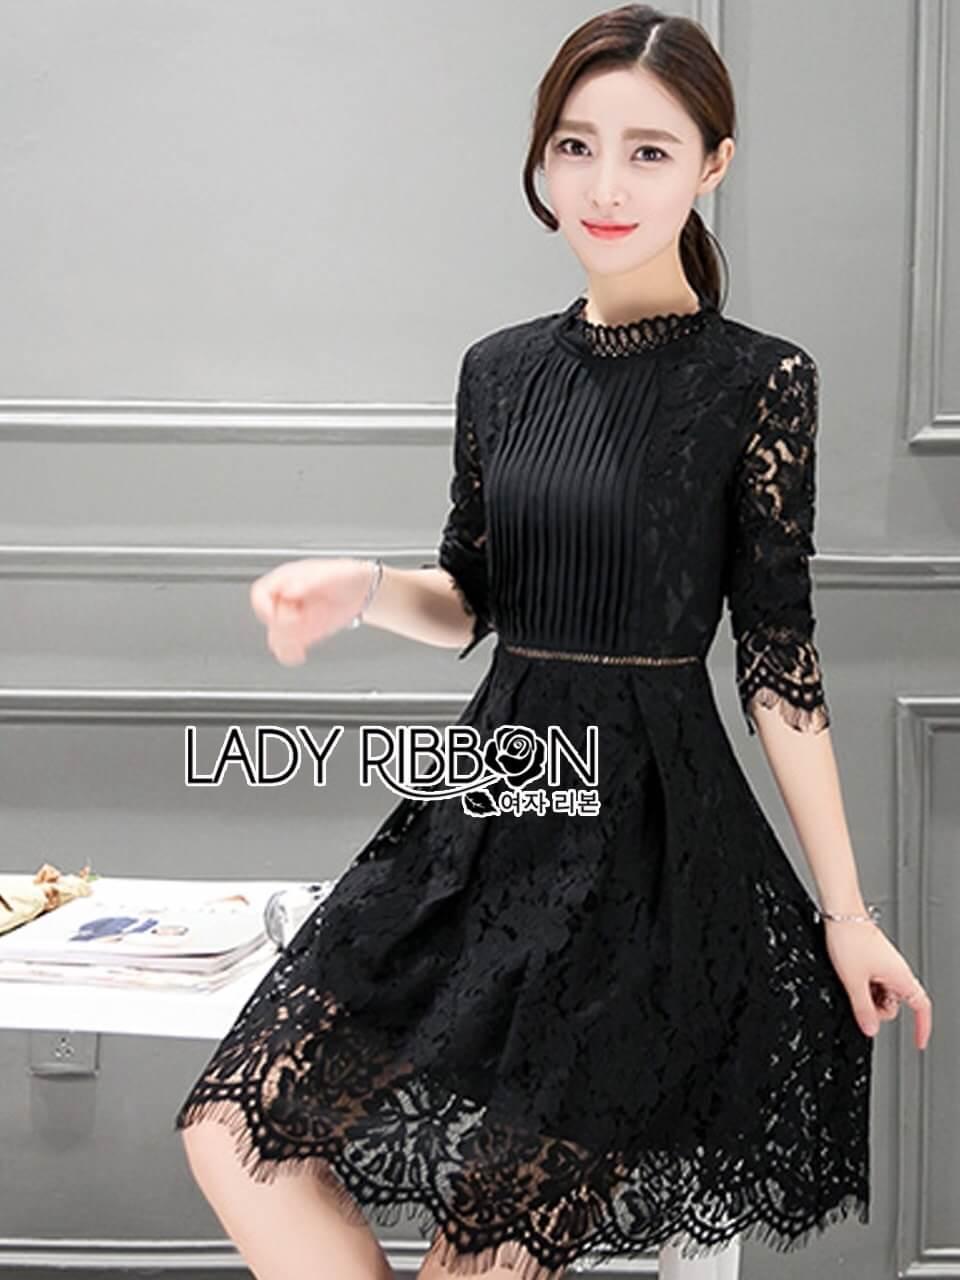 &#x1F380 Lady Ribbon's Made &#x1F380 Lady Christina Classic Feminine Pleated Black Dress